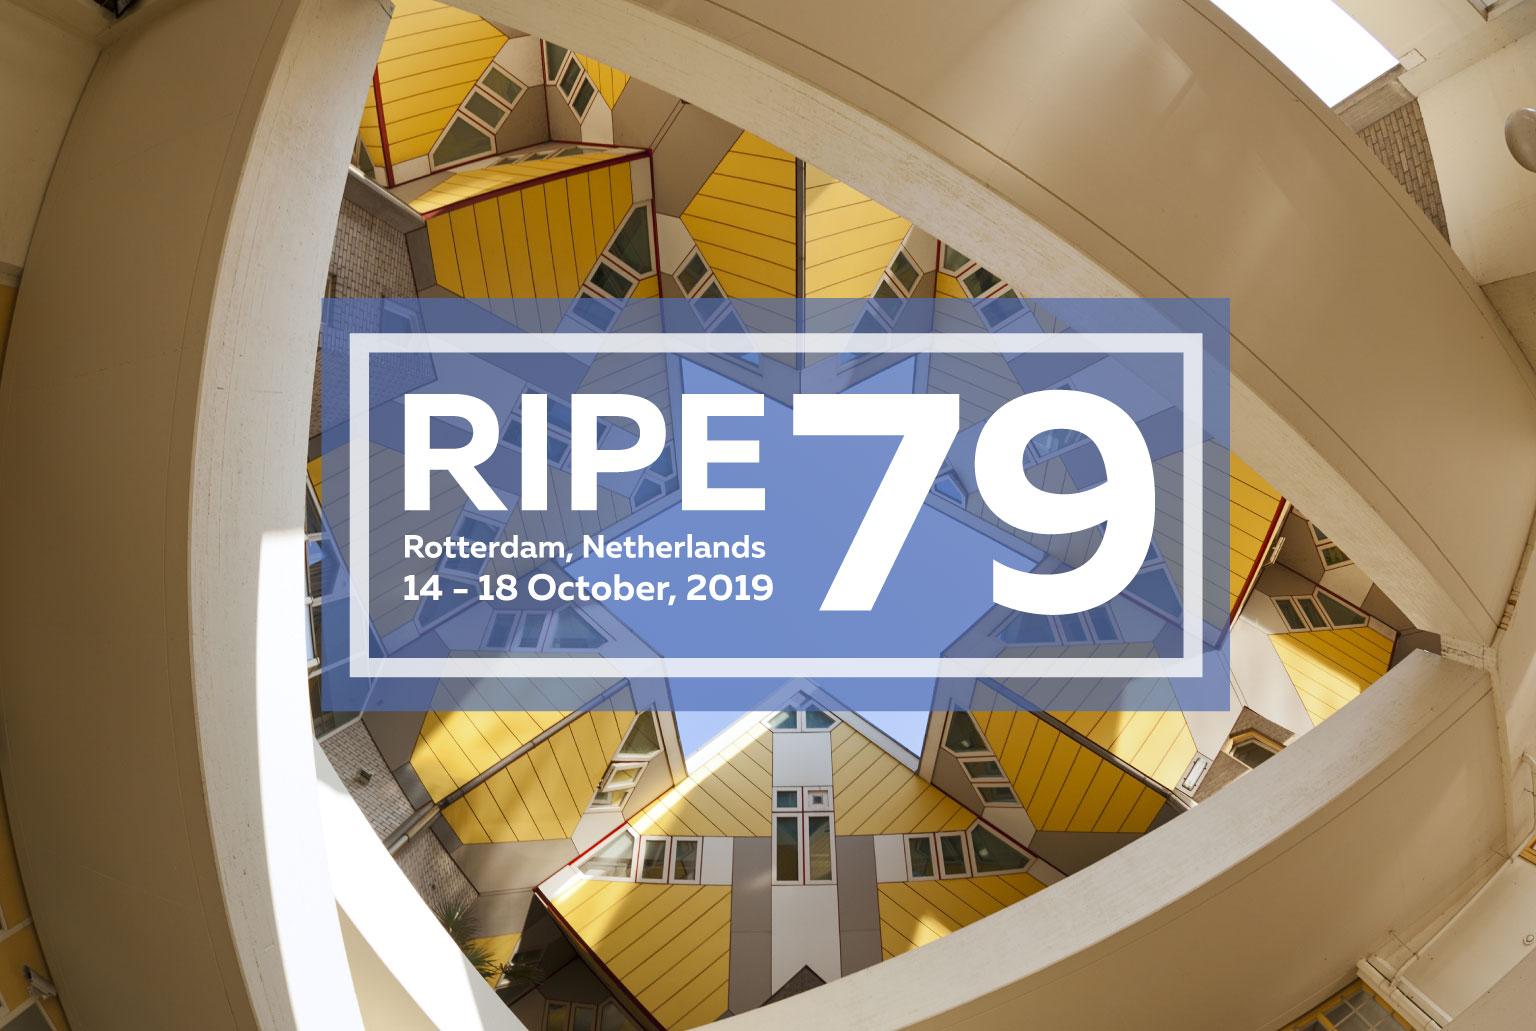 RIPE 79